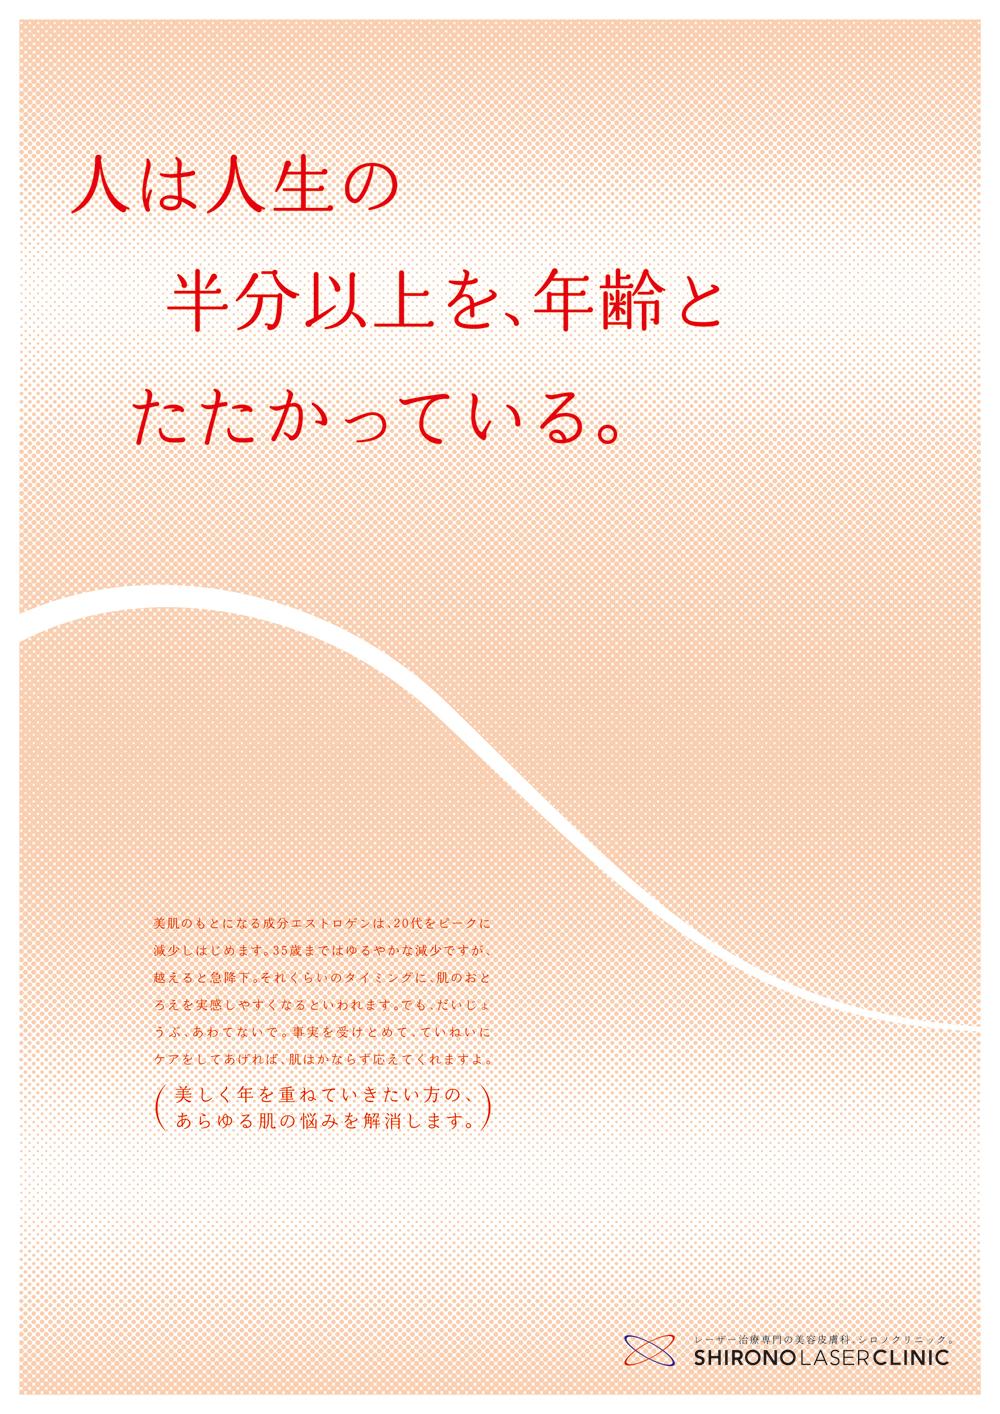 SHIRONO-LASER-CLINIC-01